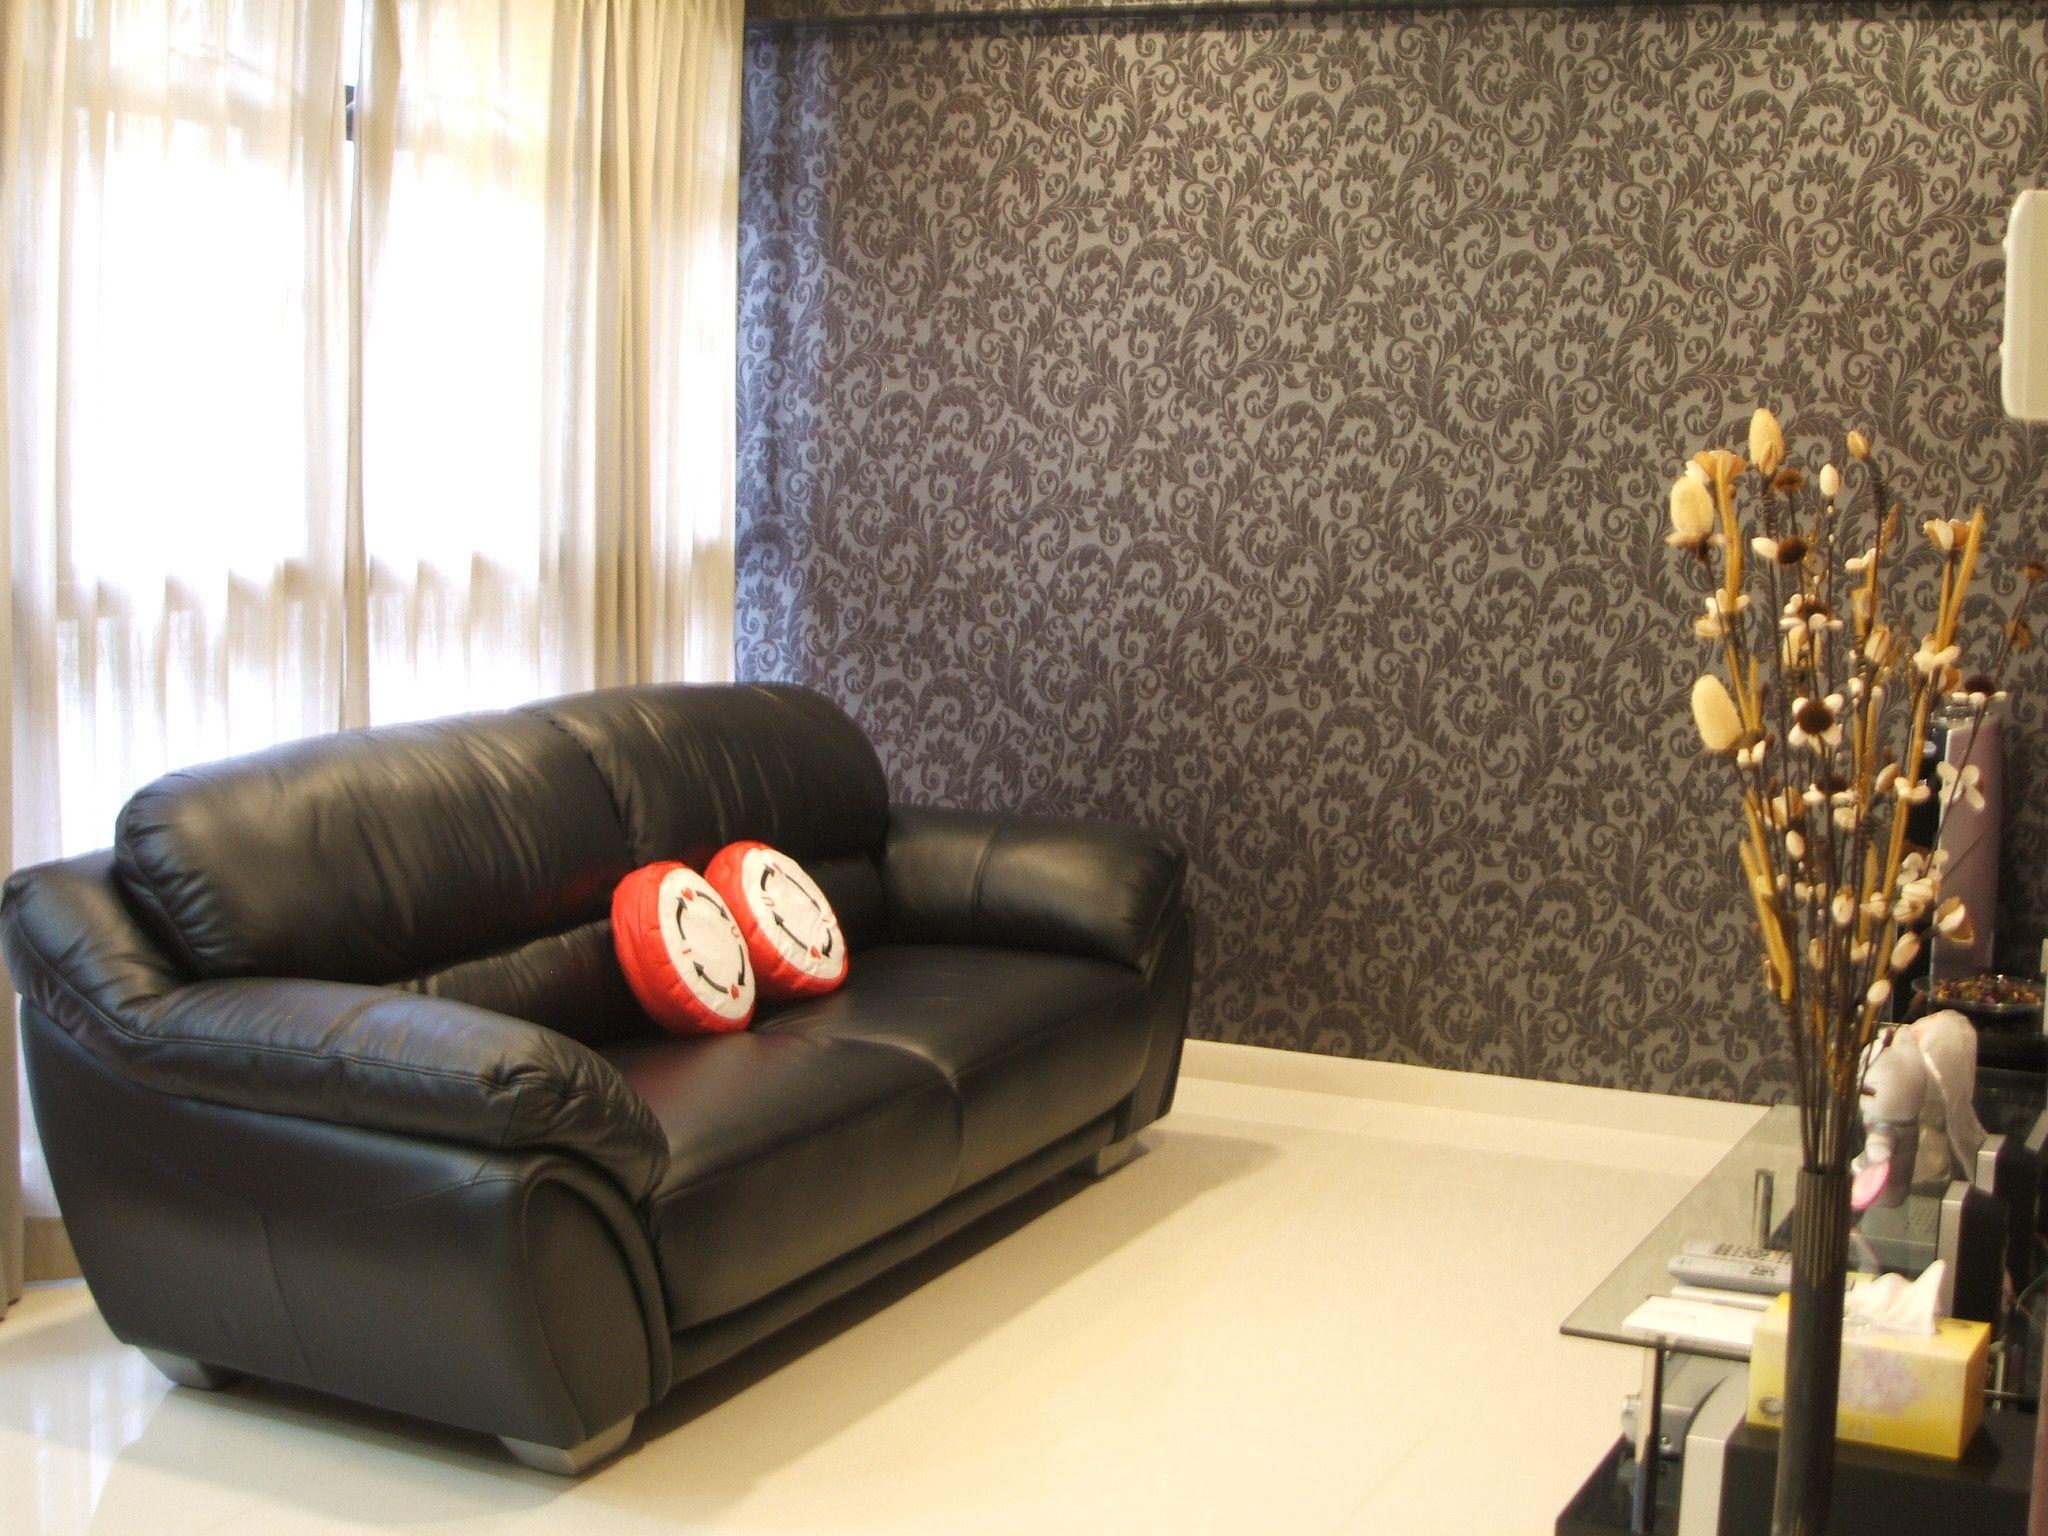 spelndid popular wallpaper designs. Engaging Living Room with Wallpaper Designs  Splendid Black Leather Loveseat Sofa Set Wheat